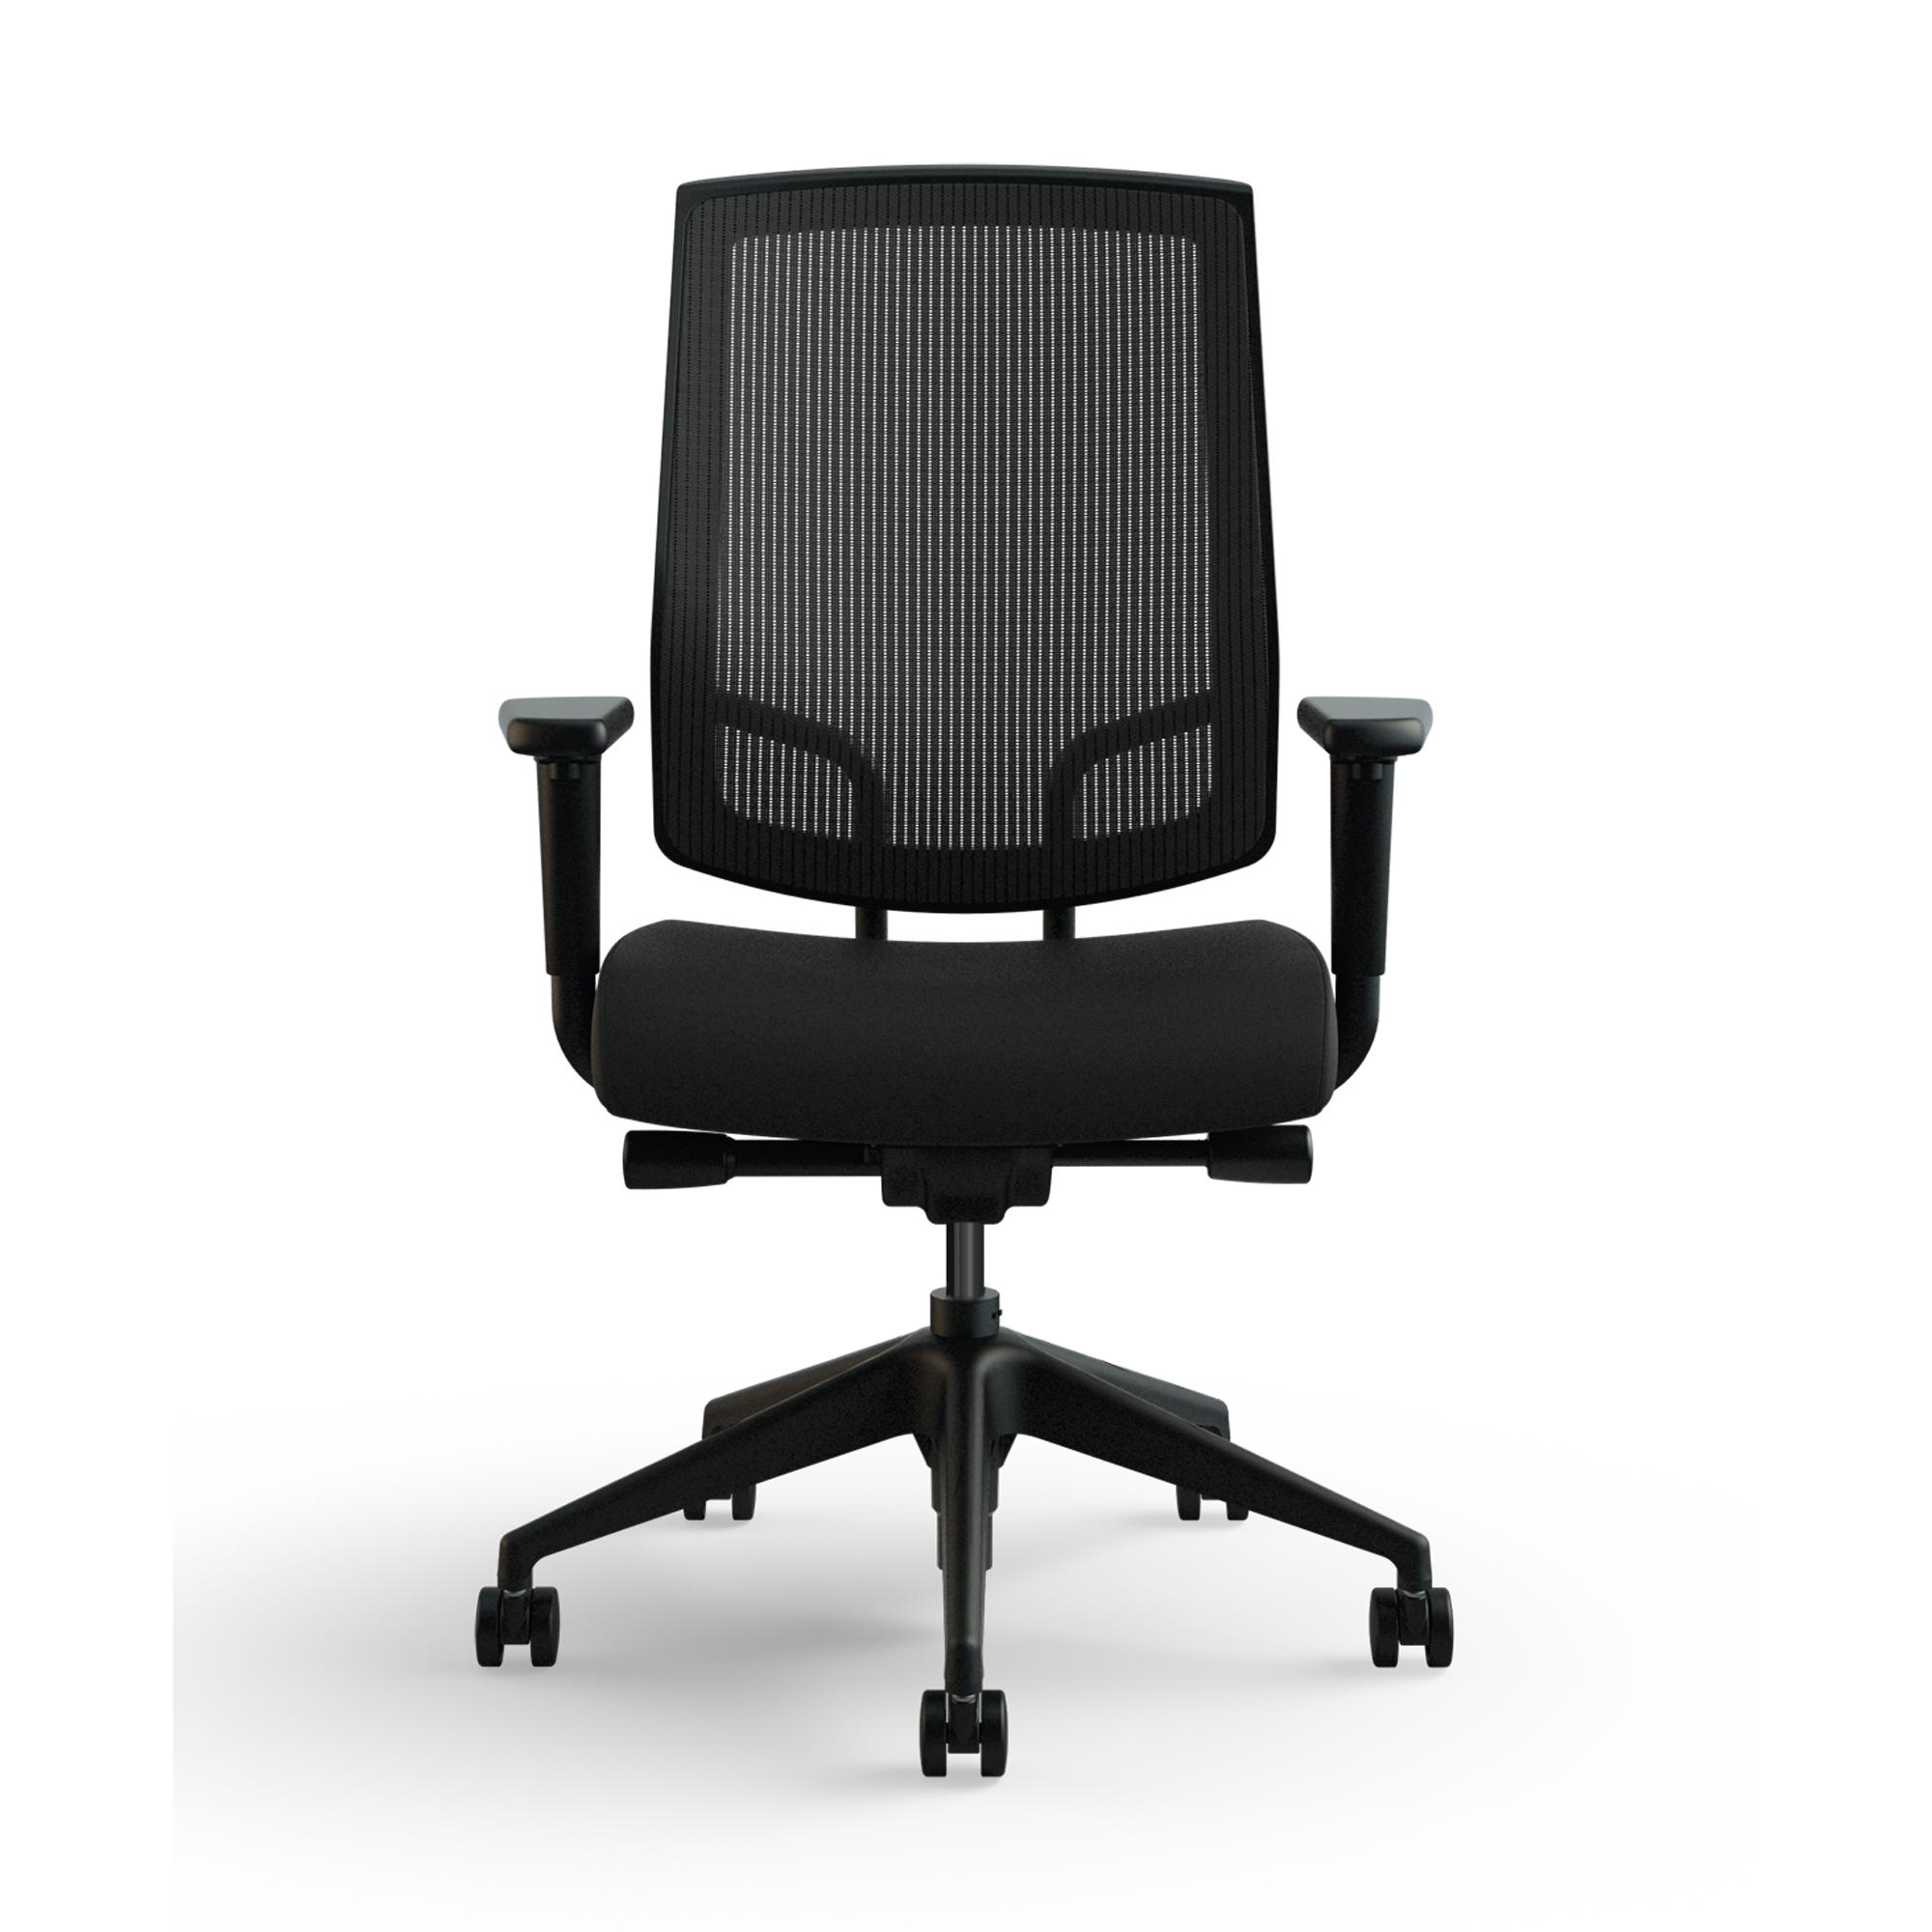 focus_work_task_chair_black_base_medium_raven_front.jpg